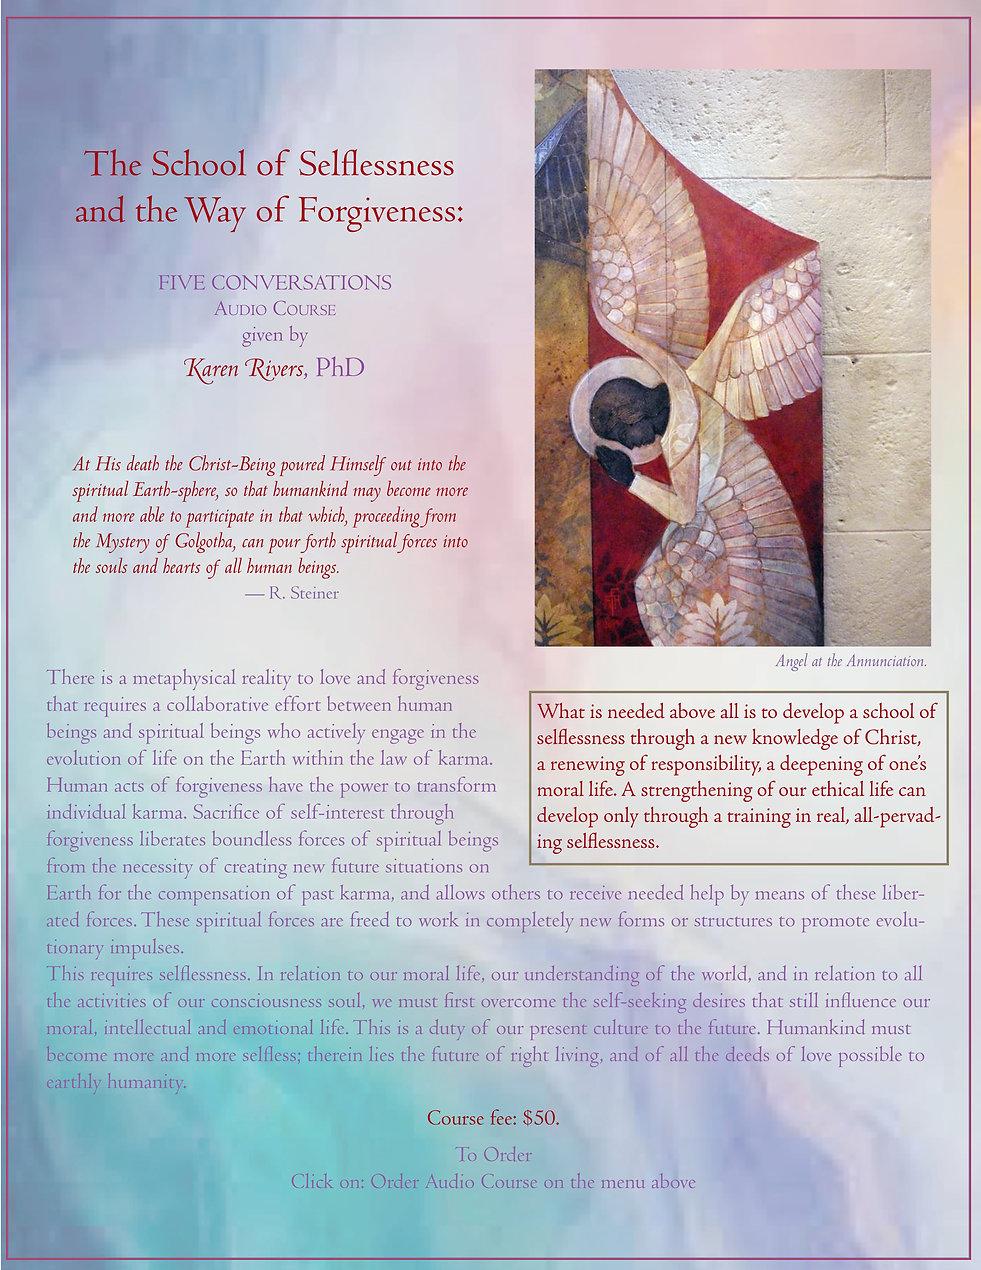 The School of Selflessness and Forgivene